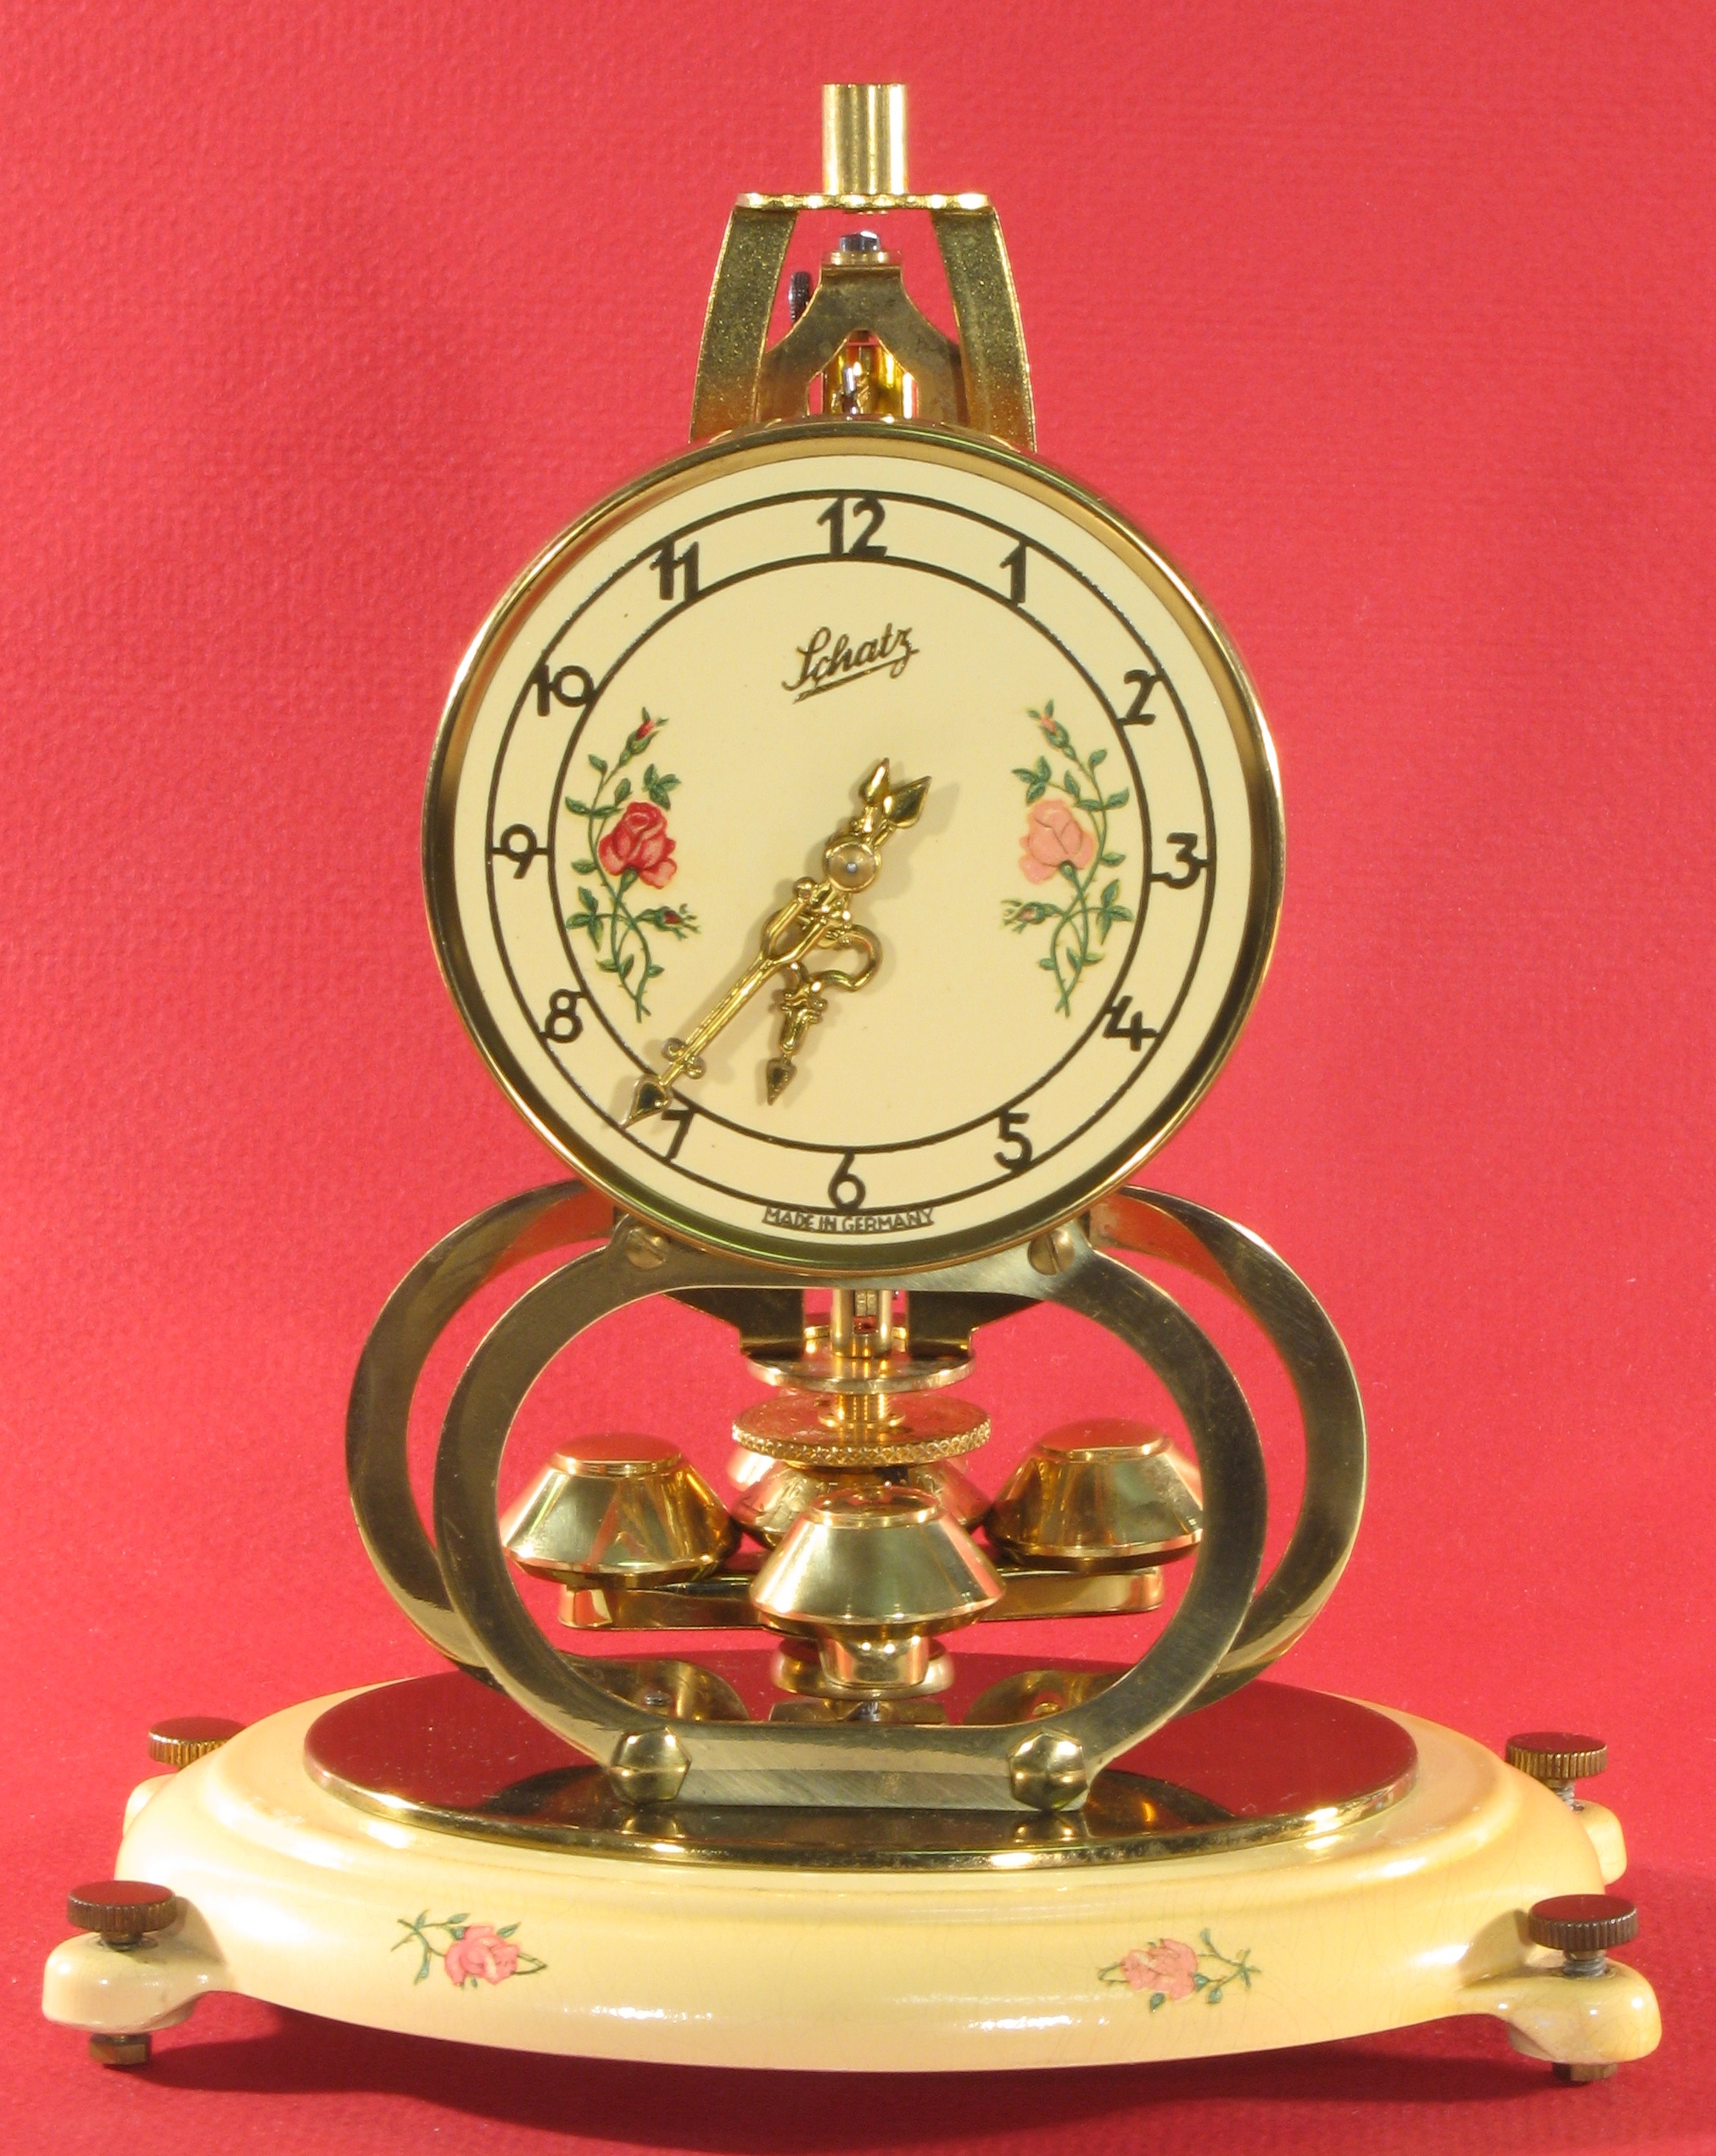 Schatz Mademoiselle 400 Day Clock Clockinfo Com